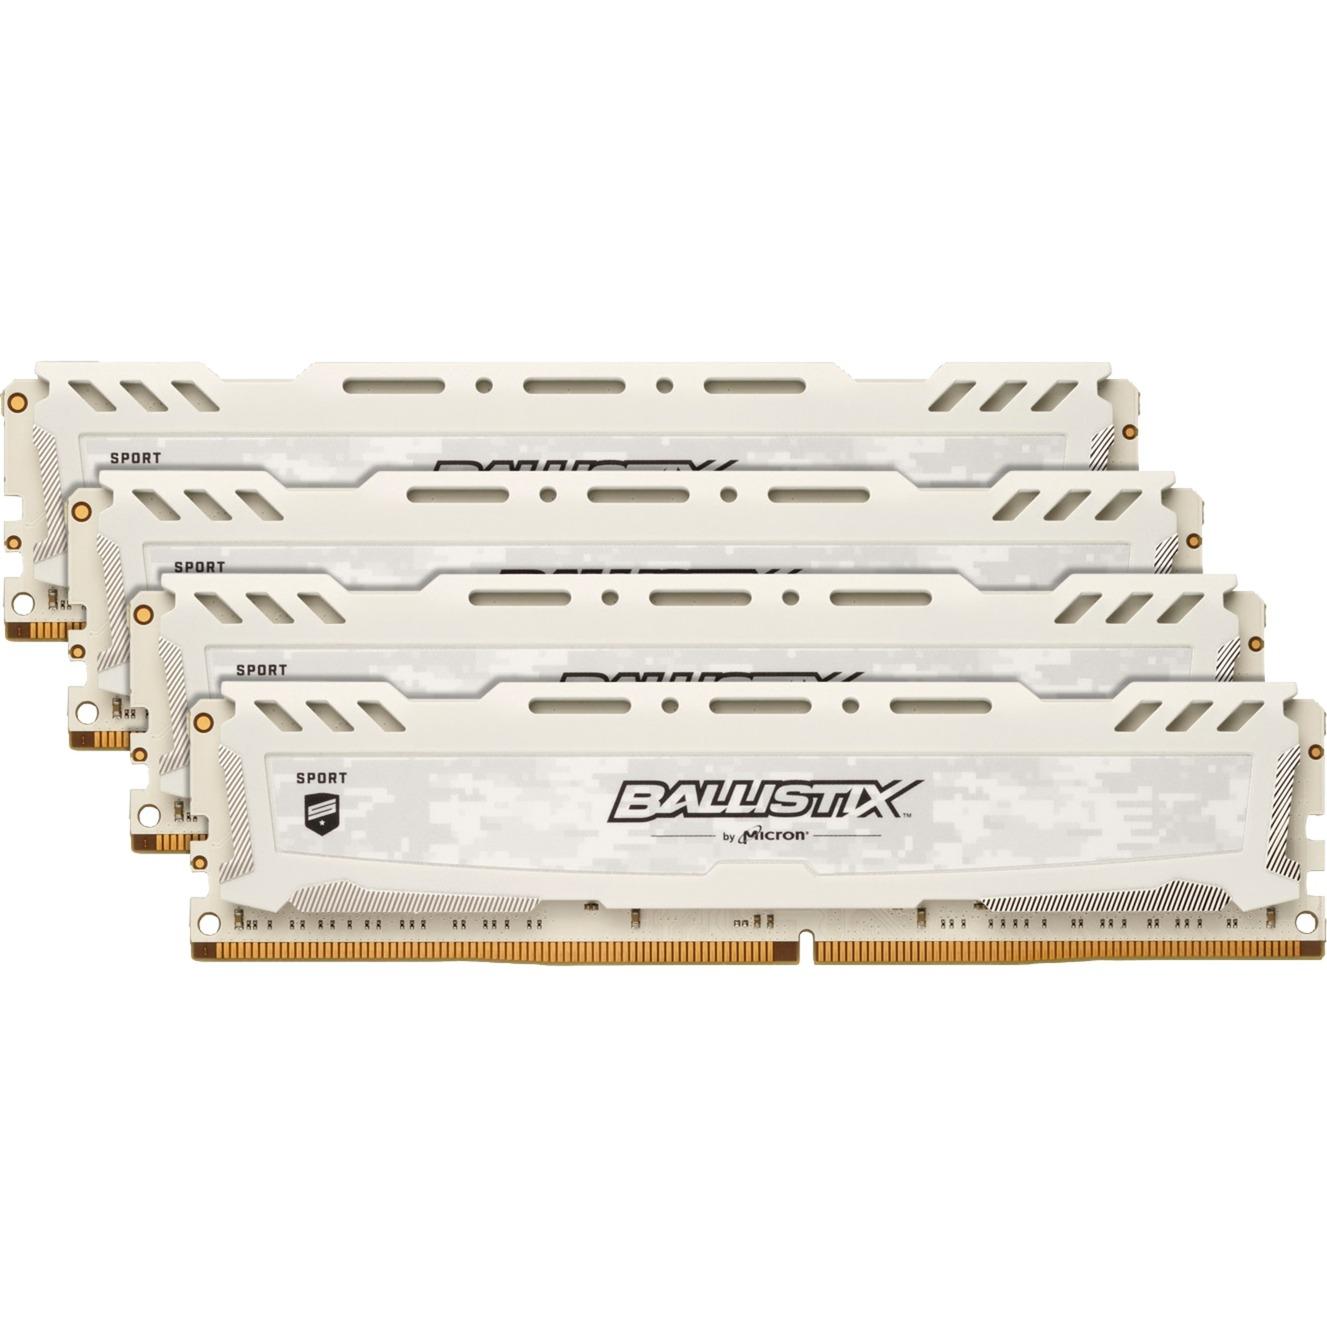 Ballistix Sport LT 16GB DDR4-2666 16GB DDR4 2666MHz módulo de memoria, Memoria RAM